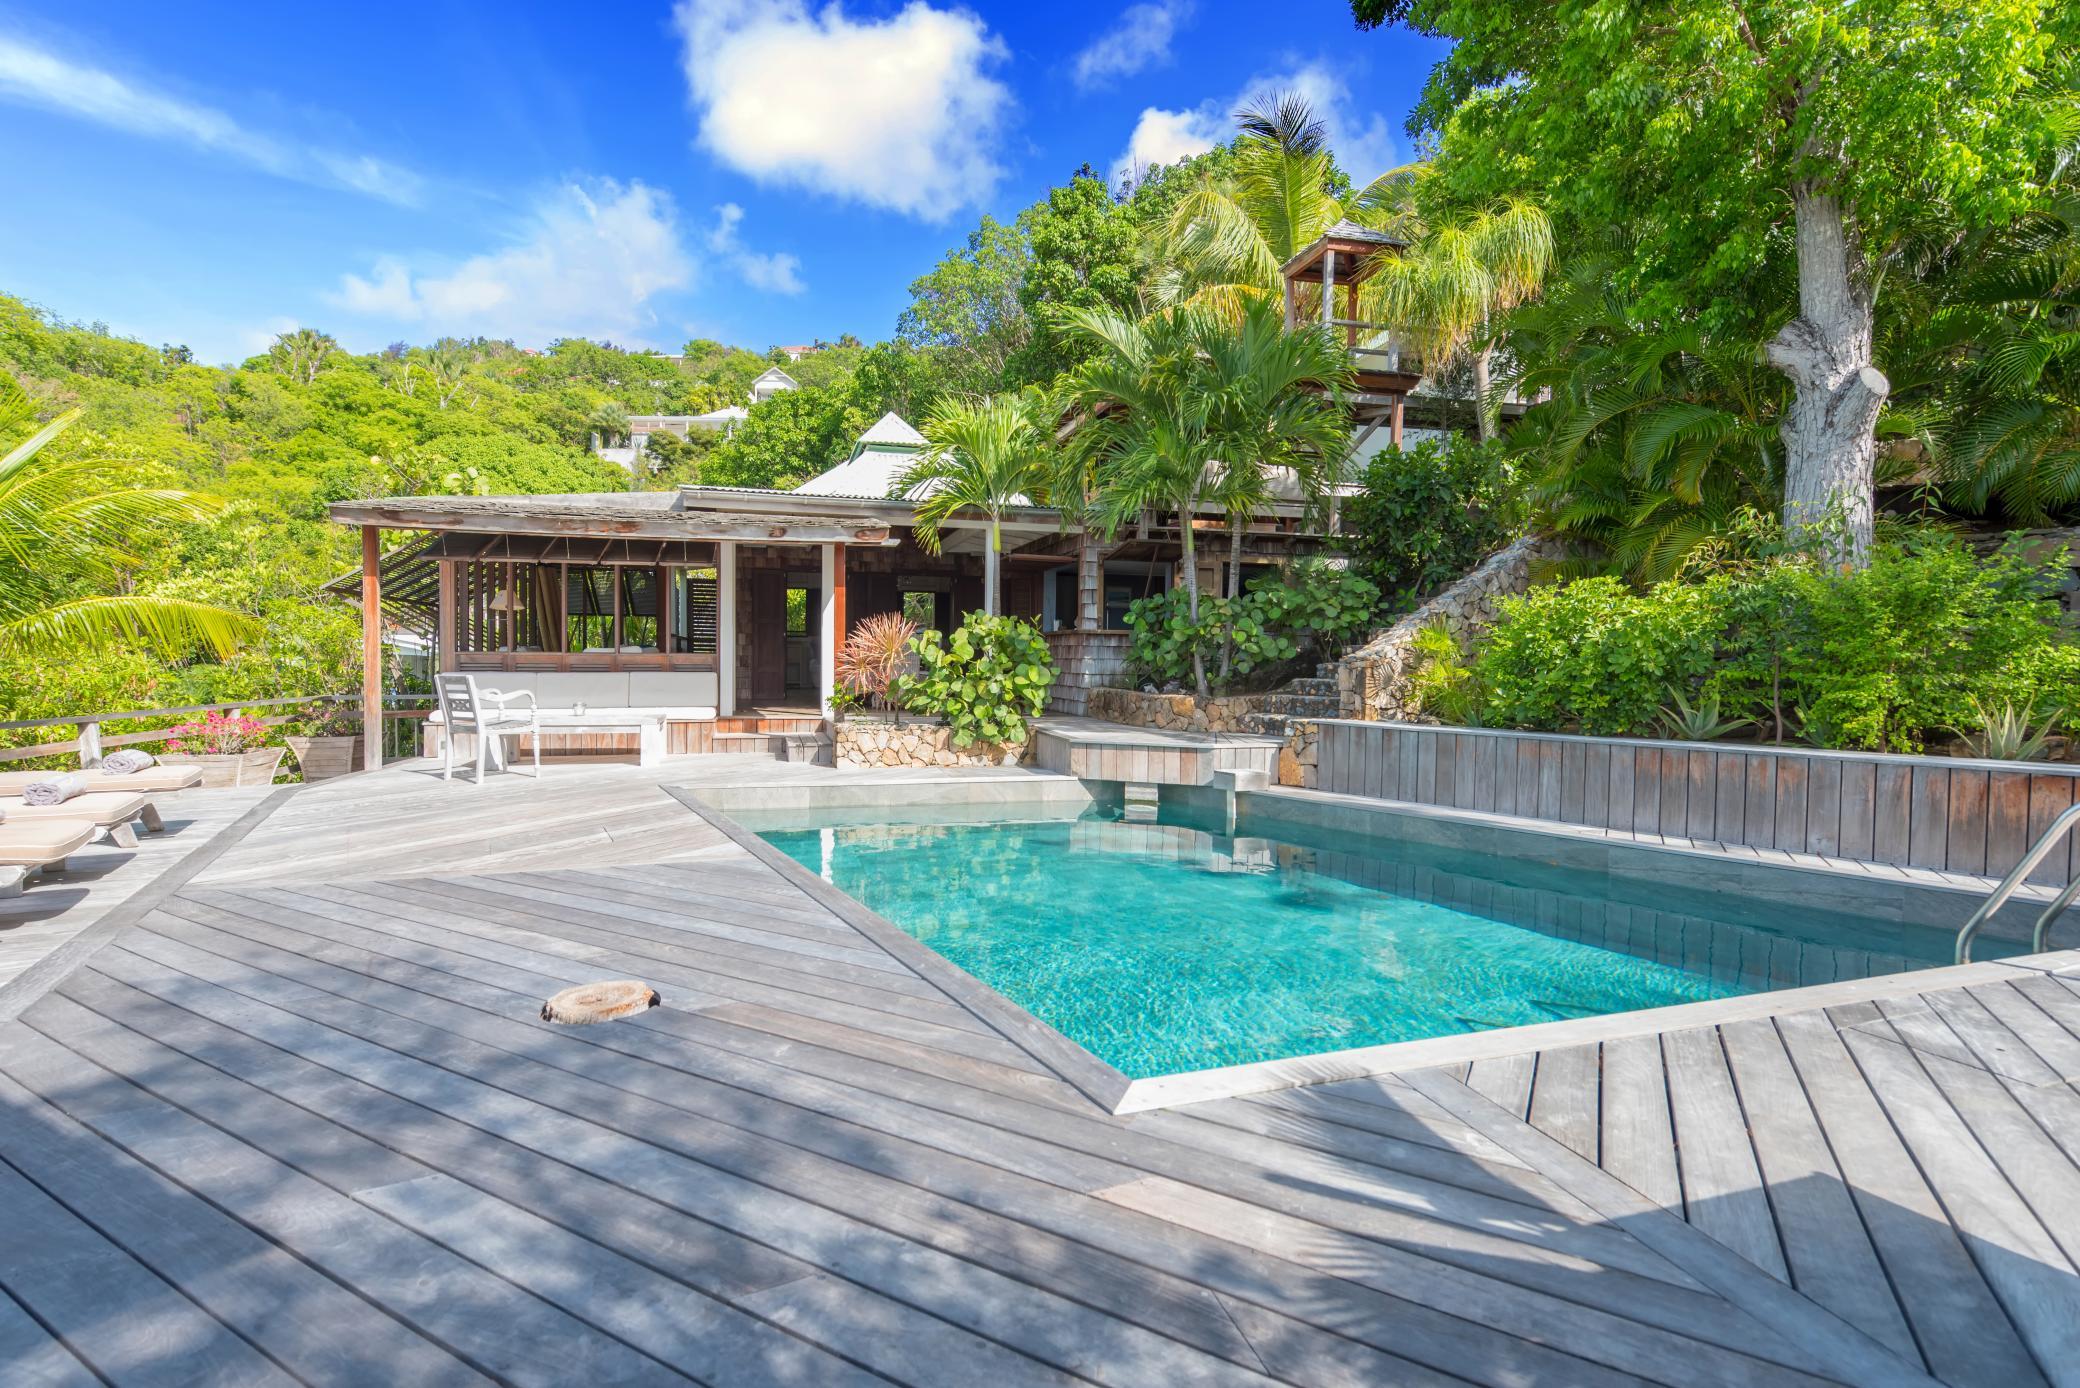 St Barth Gustavia luxury villas to rent - All Luxury Apartments